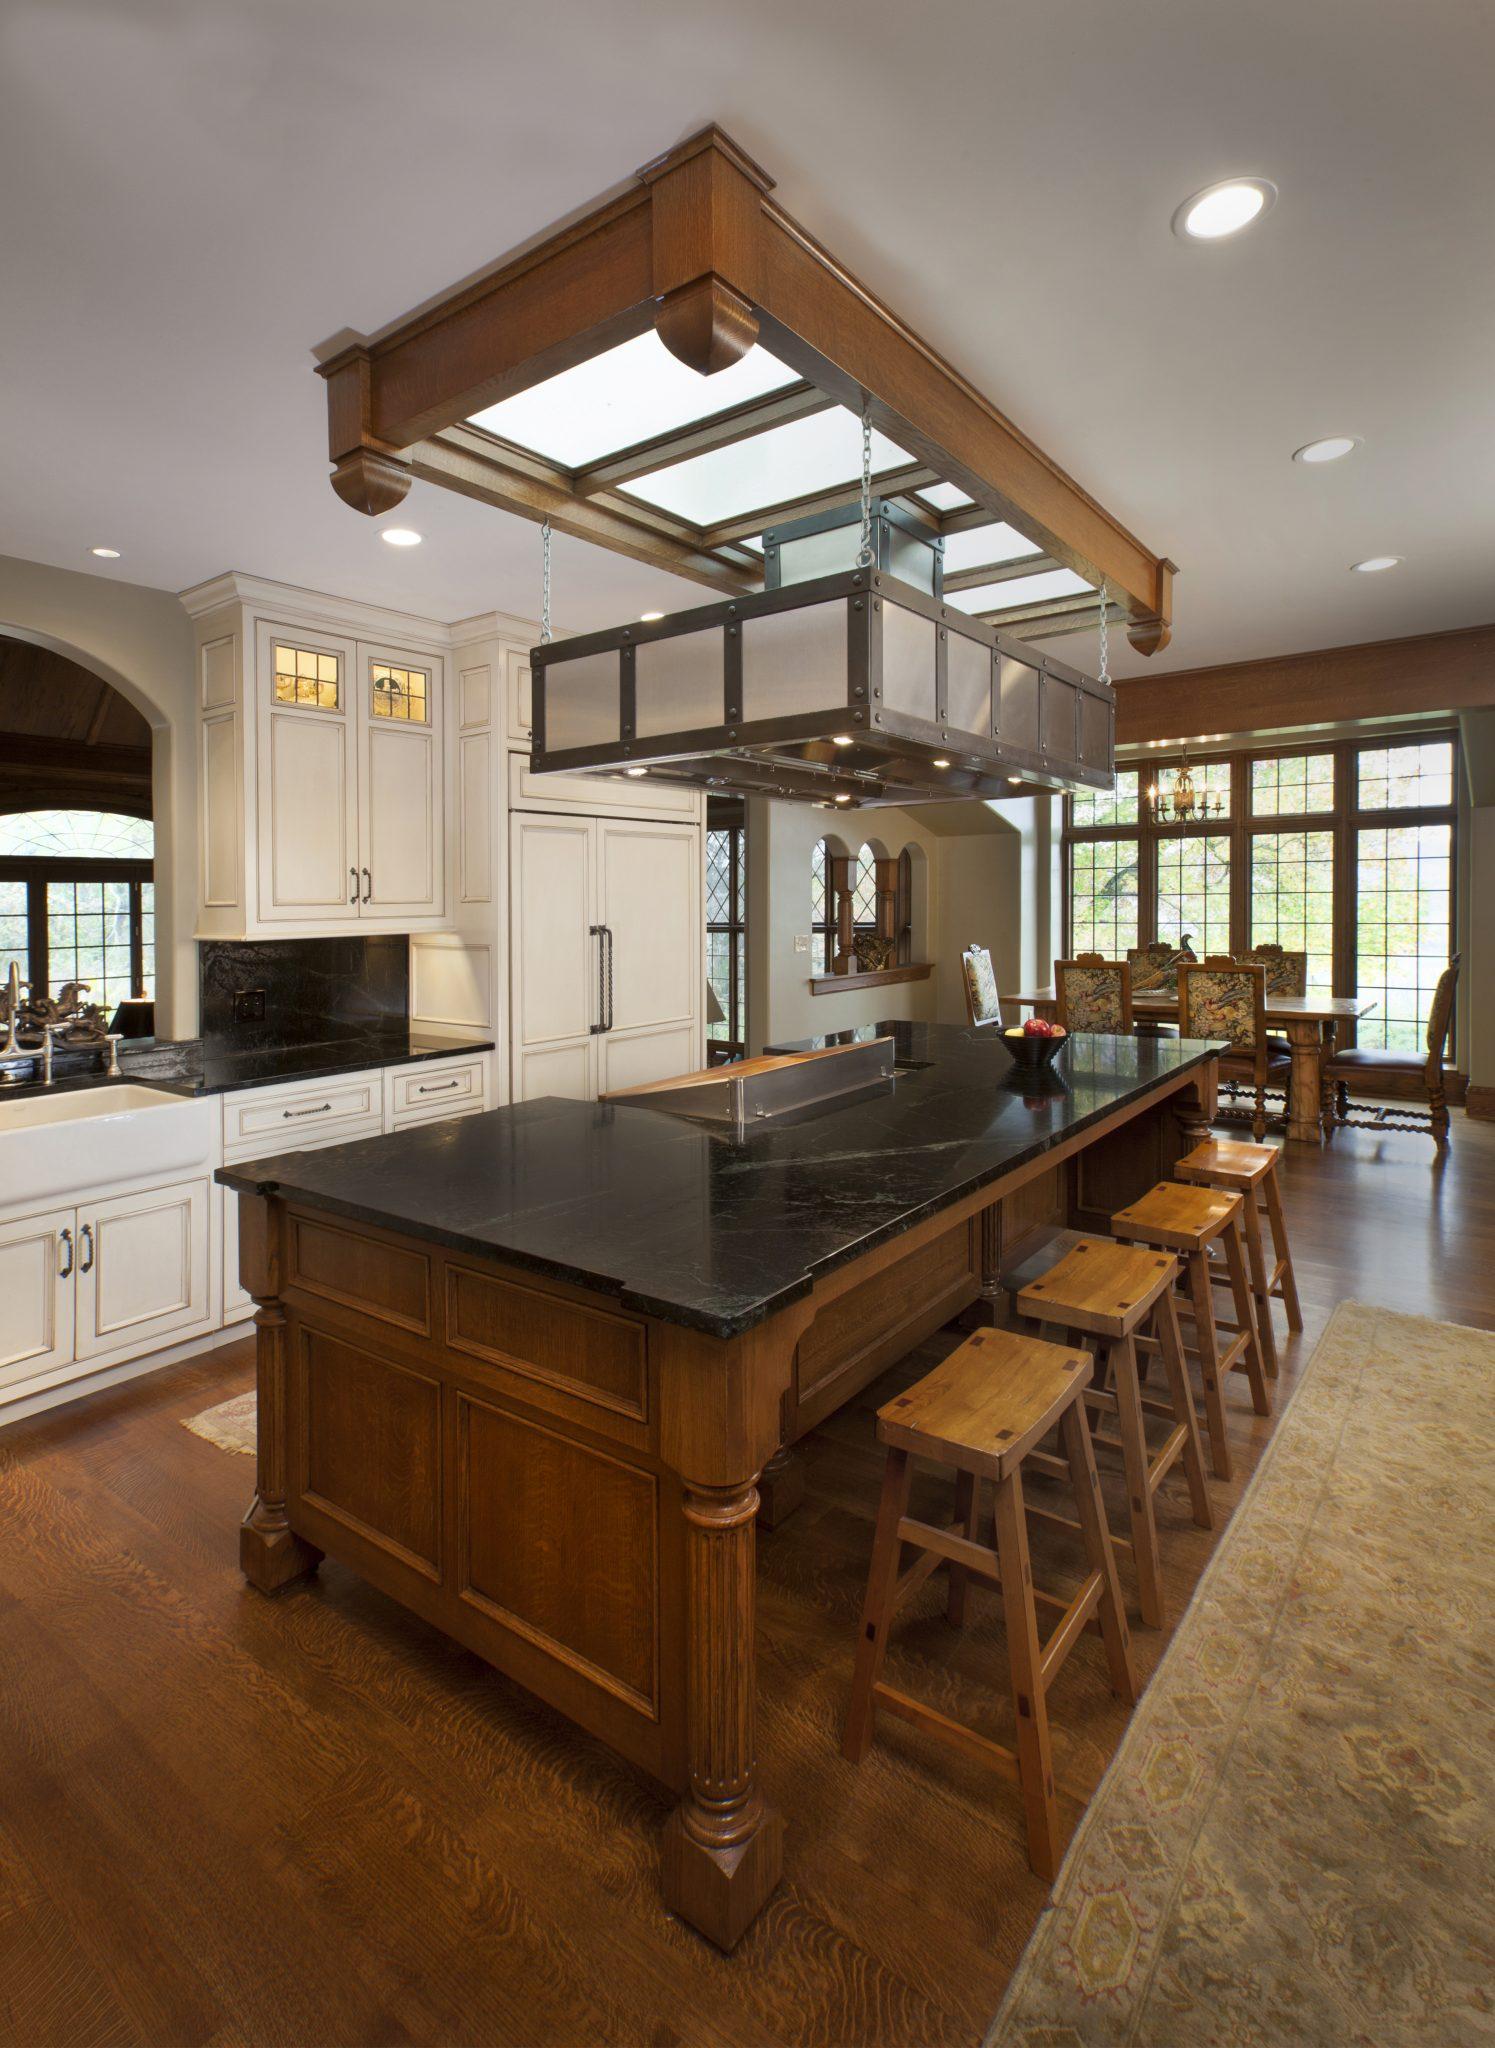 Tudor Kitchen Remodel Island RWA Architects - Tudor kitchen remodel